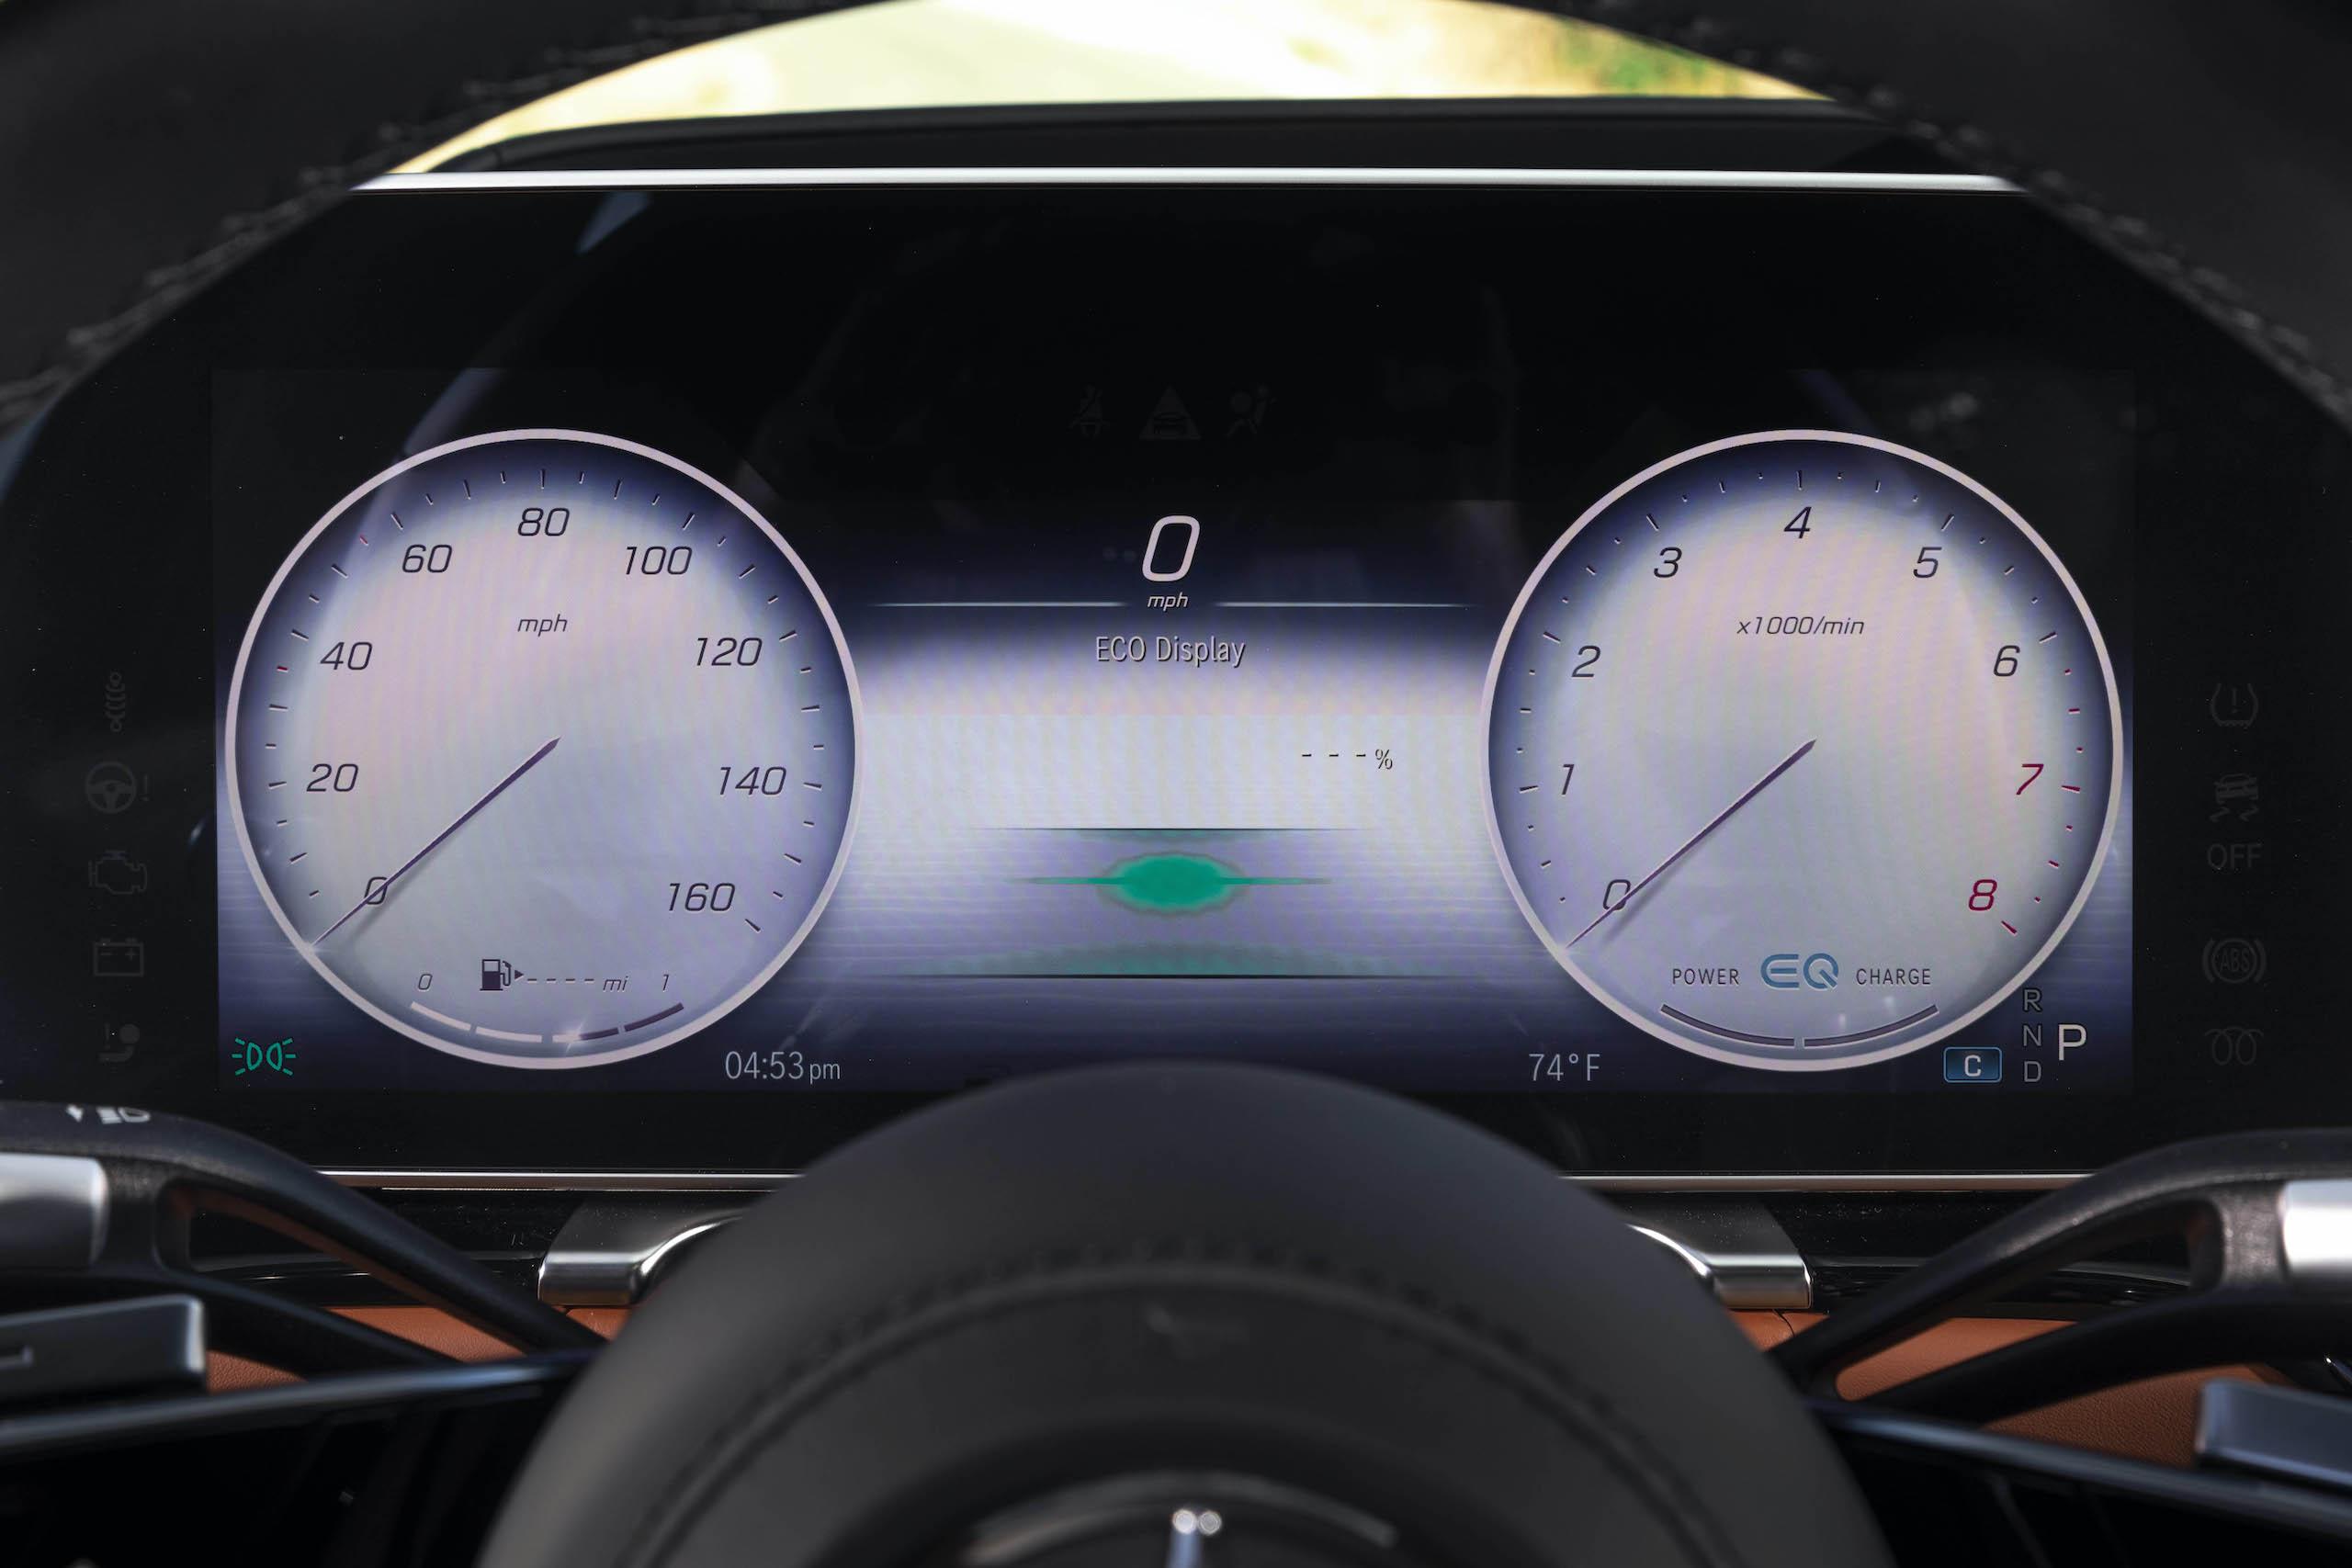 Mercedes Benz-S-Class interior dash display